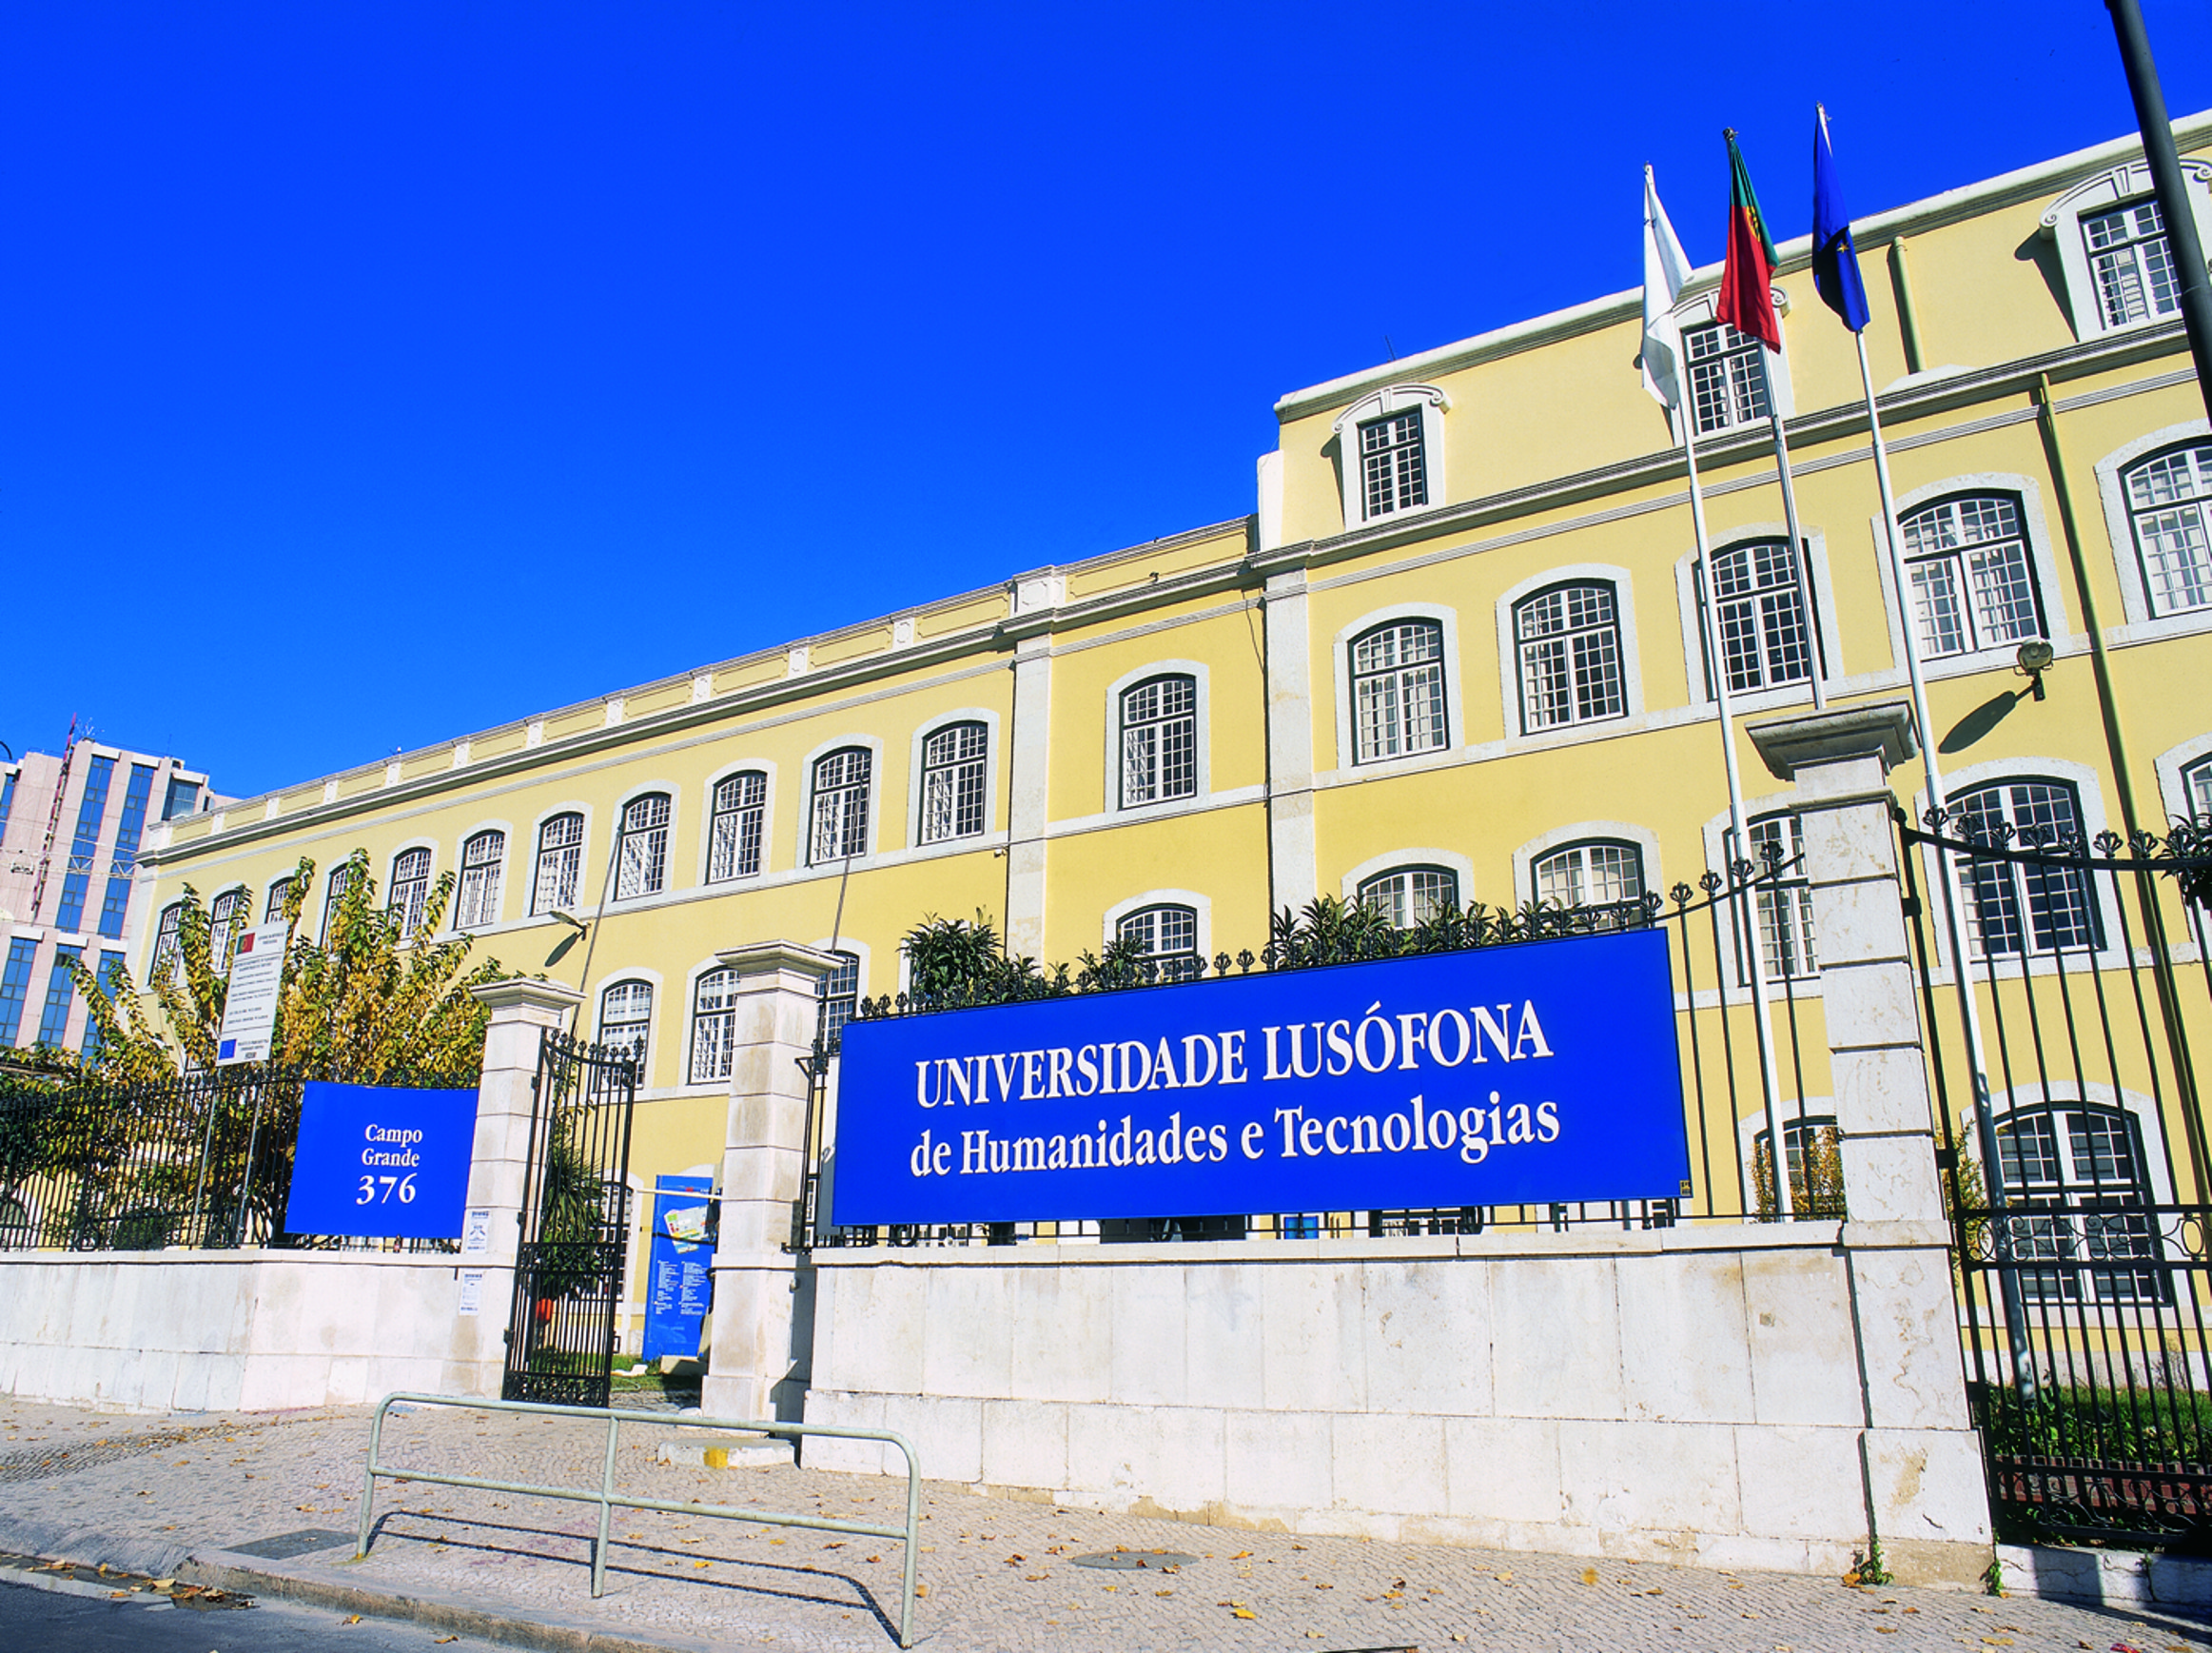 Lusofona University